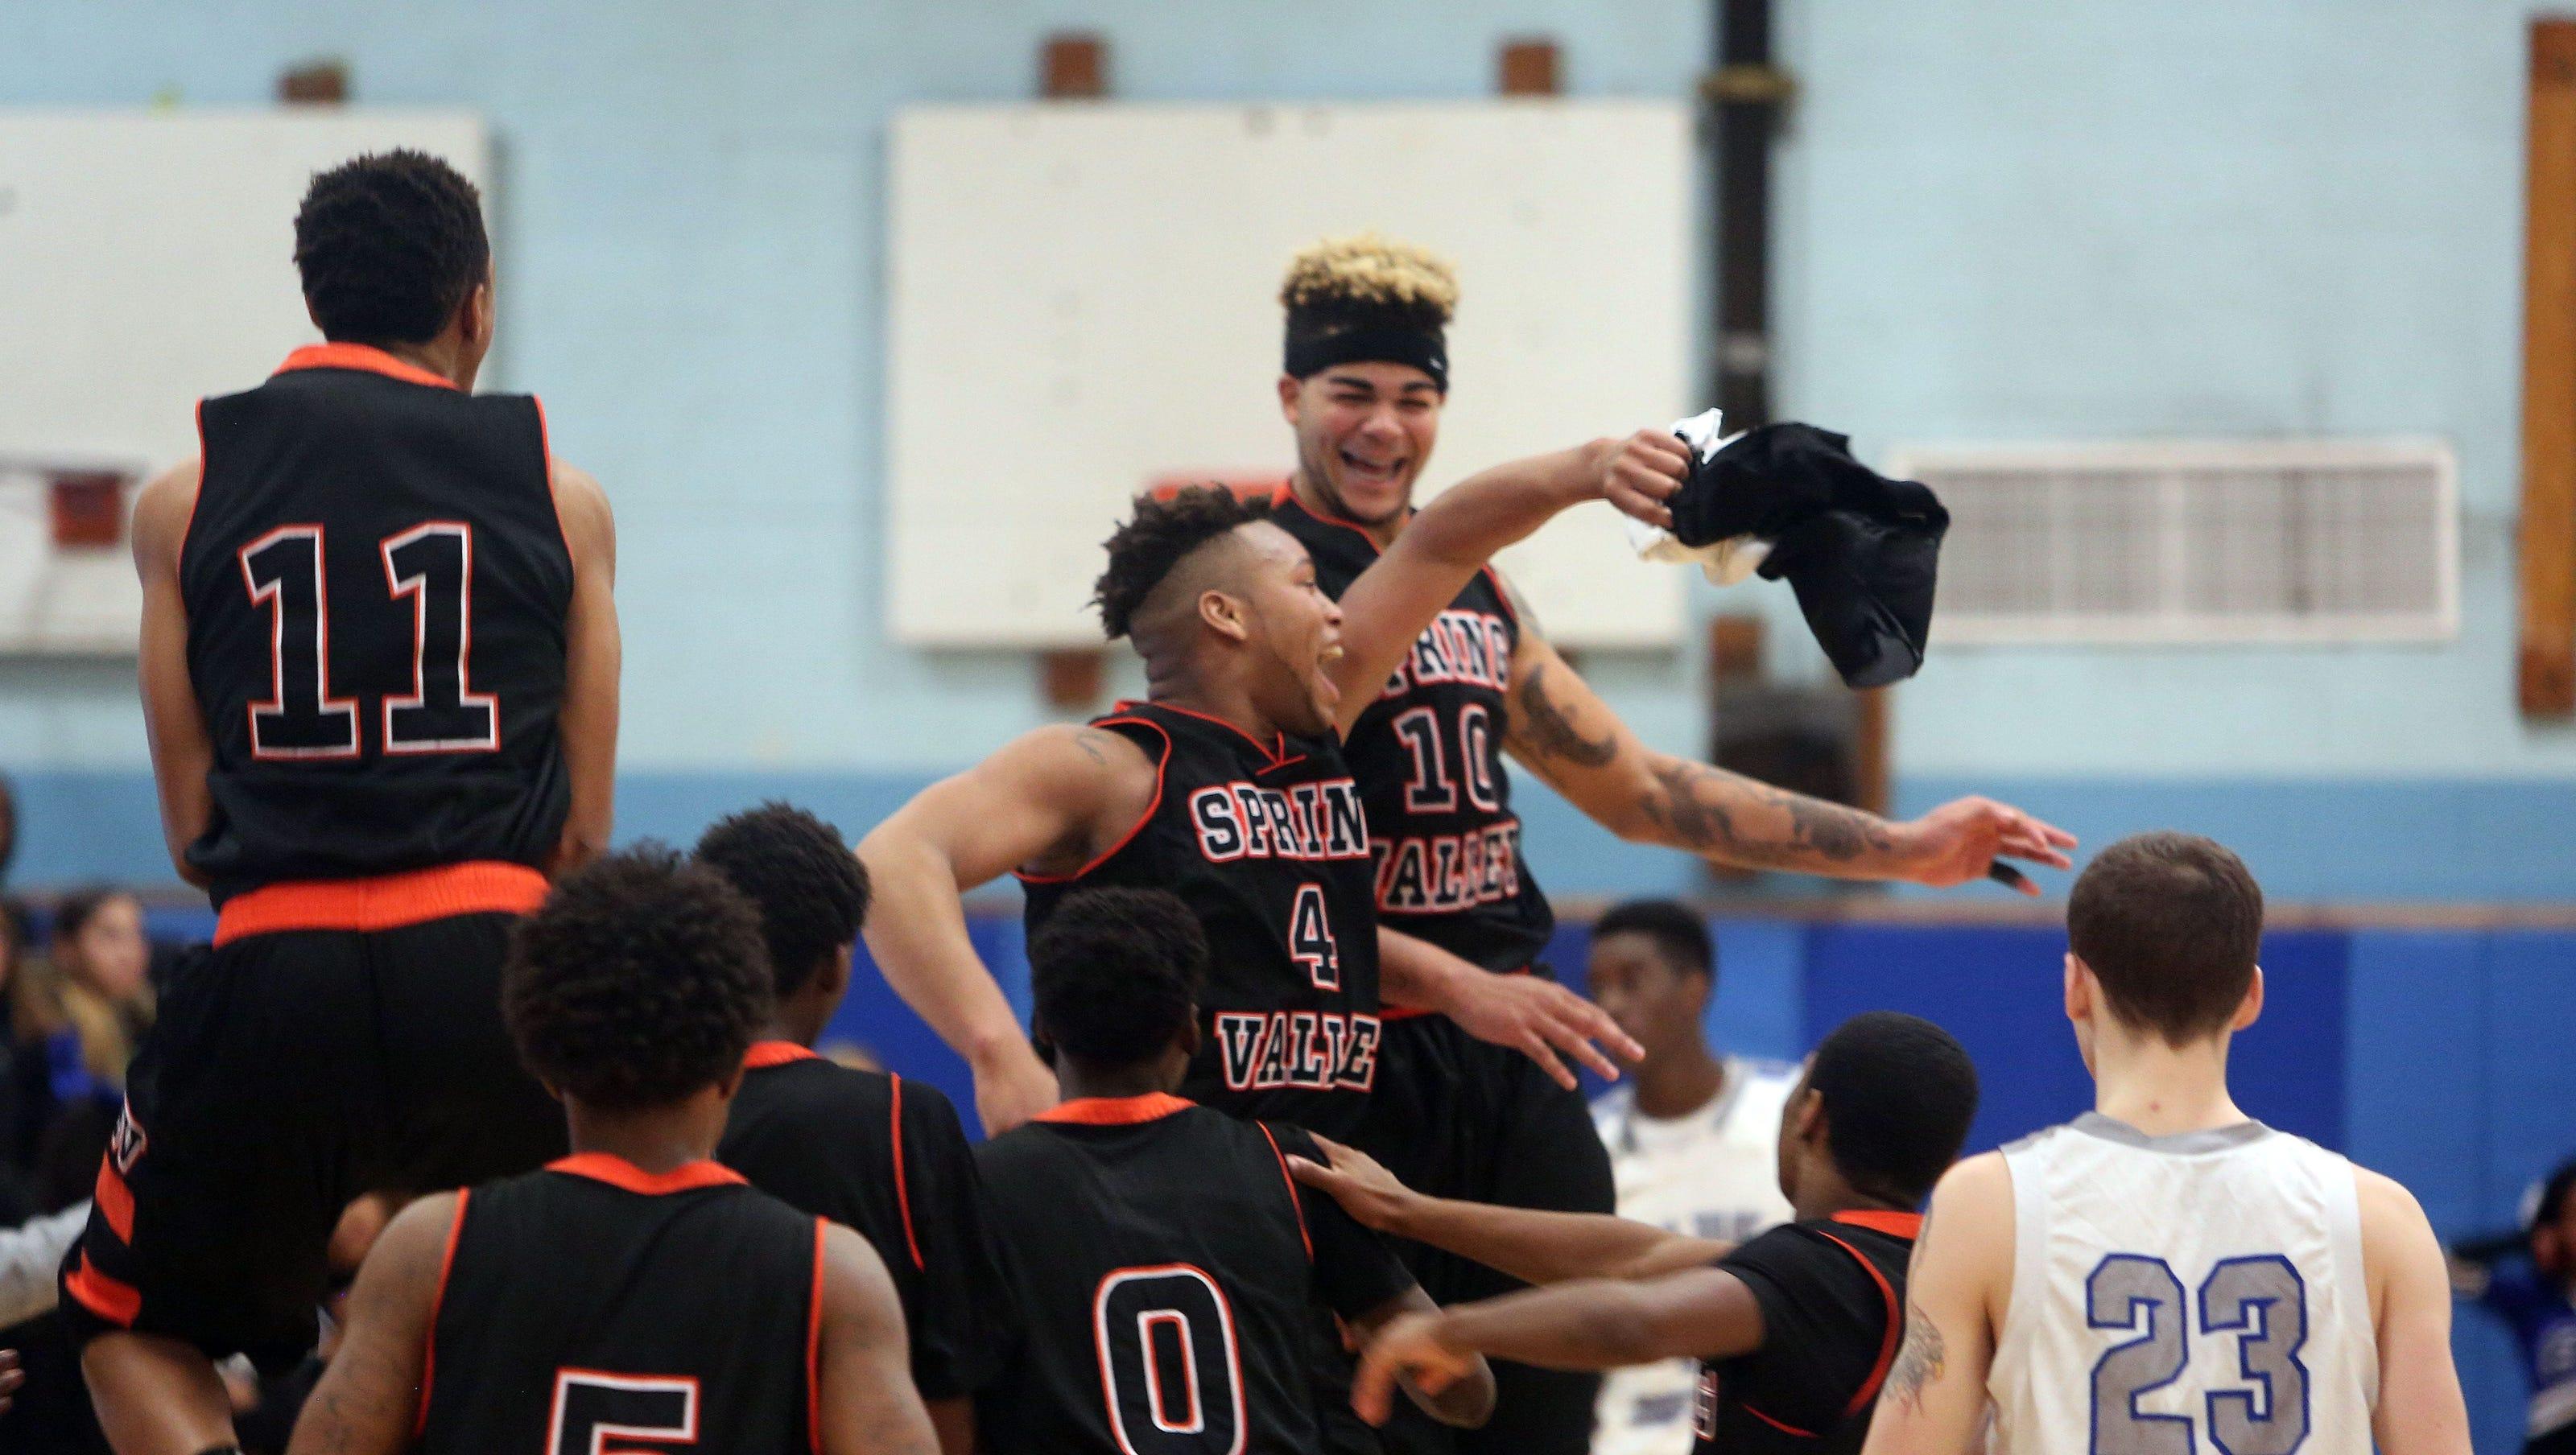 The 2016-17 boys basketball preview: Team previews